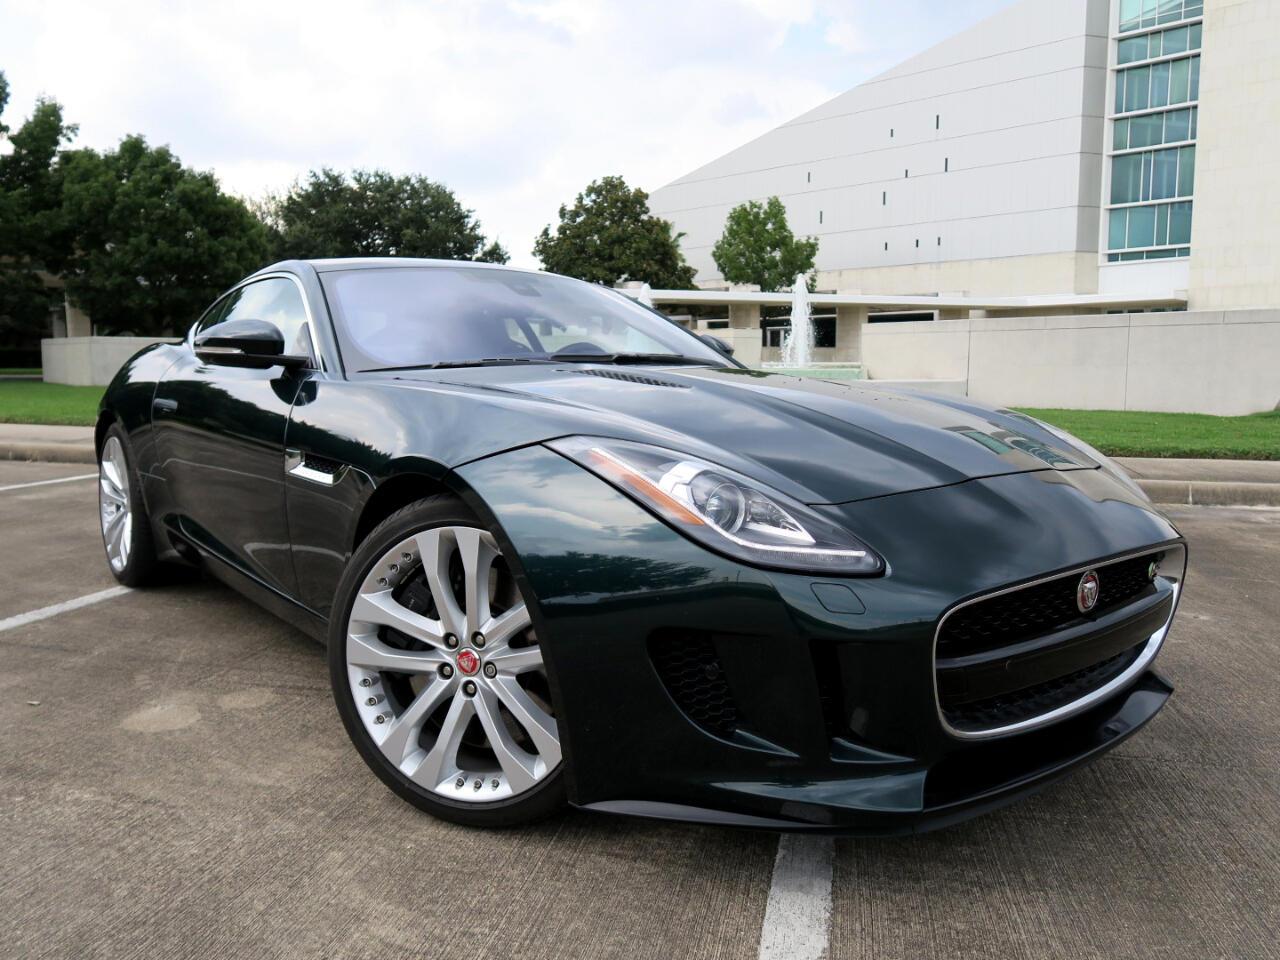 2017 Jaguar F-Type Coupe Manual S